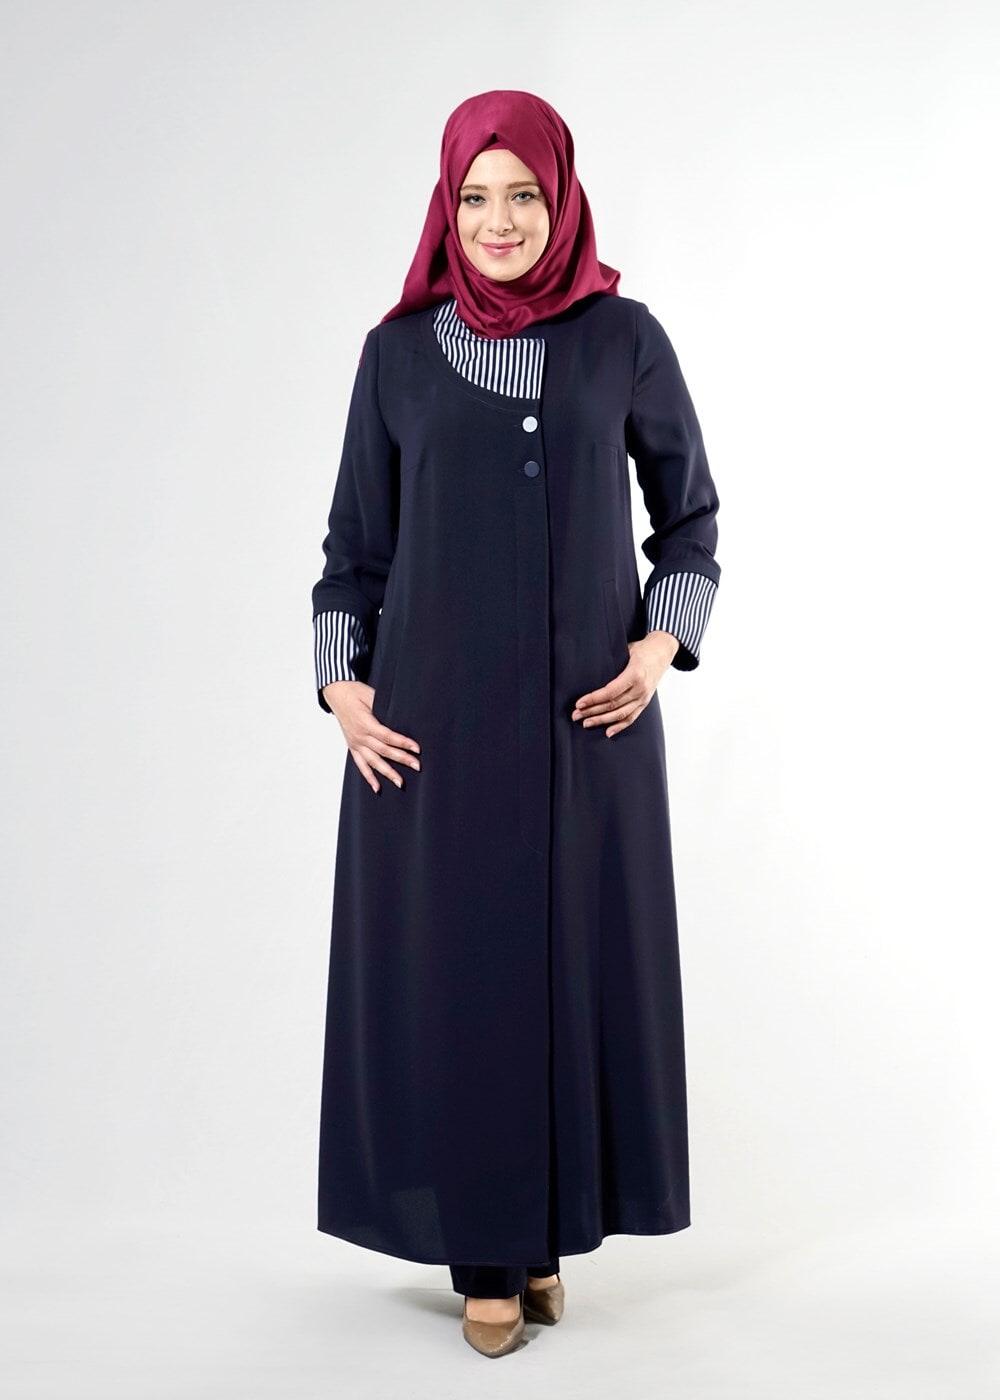 Femelle BLEU MARINE T 1588 Farah Tesettür Pardesü-Alv Fashion